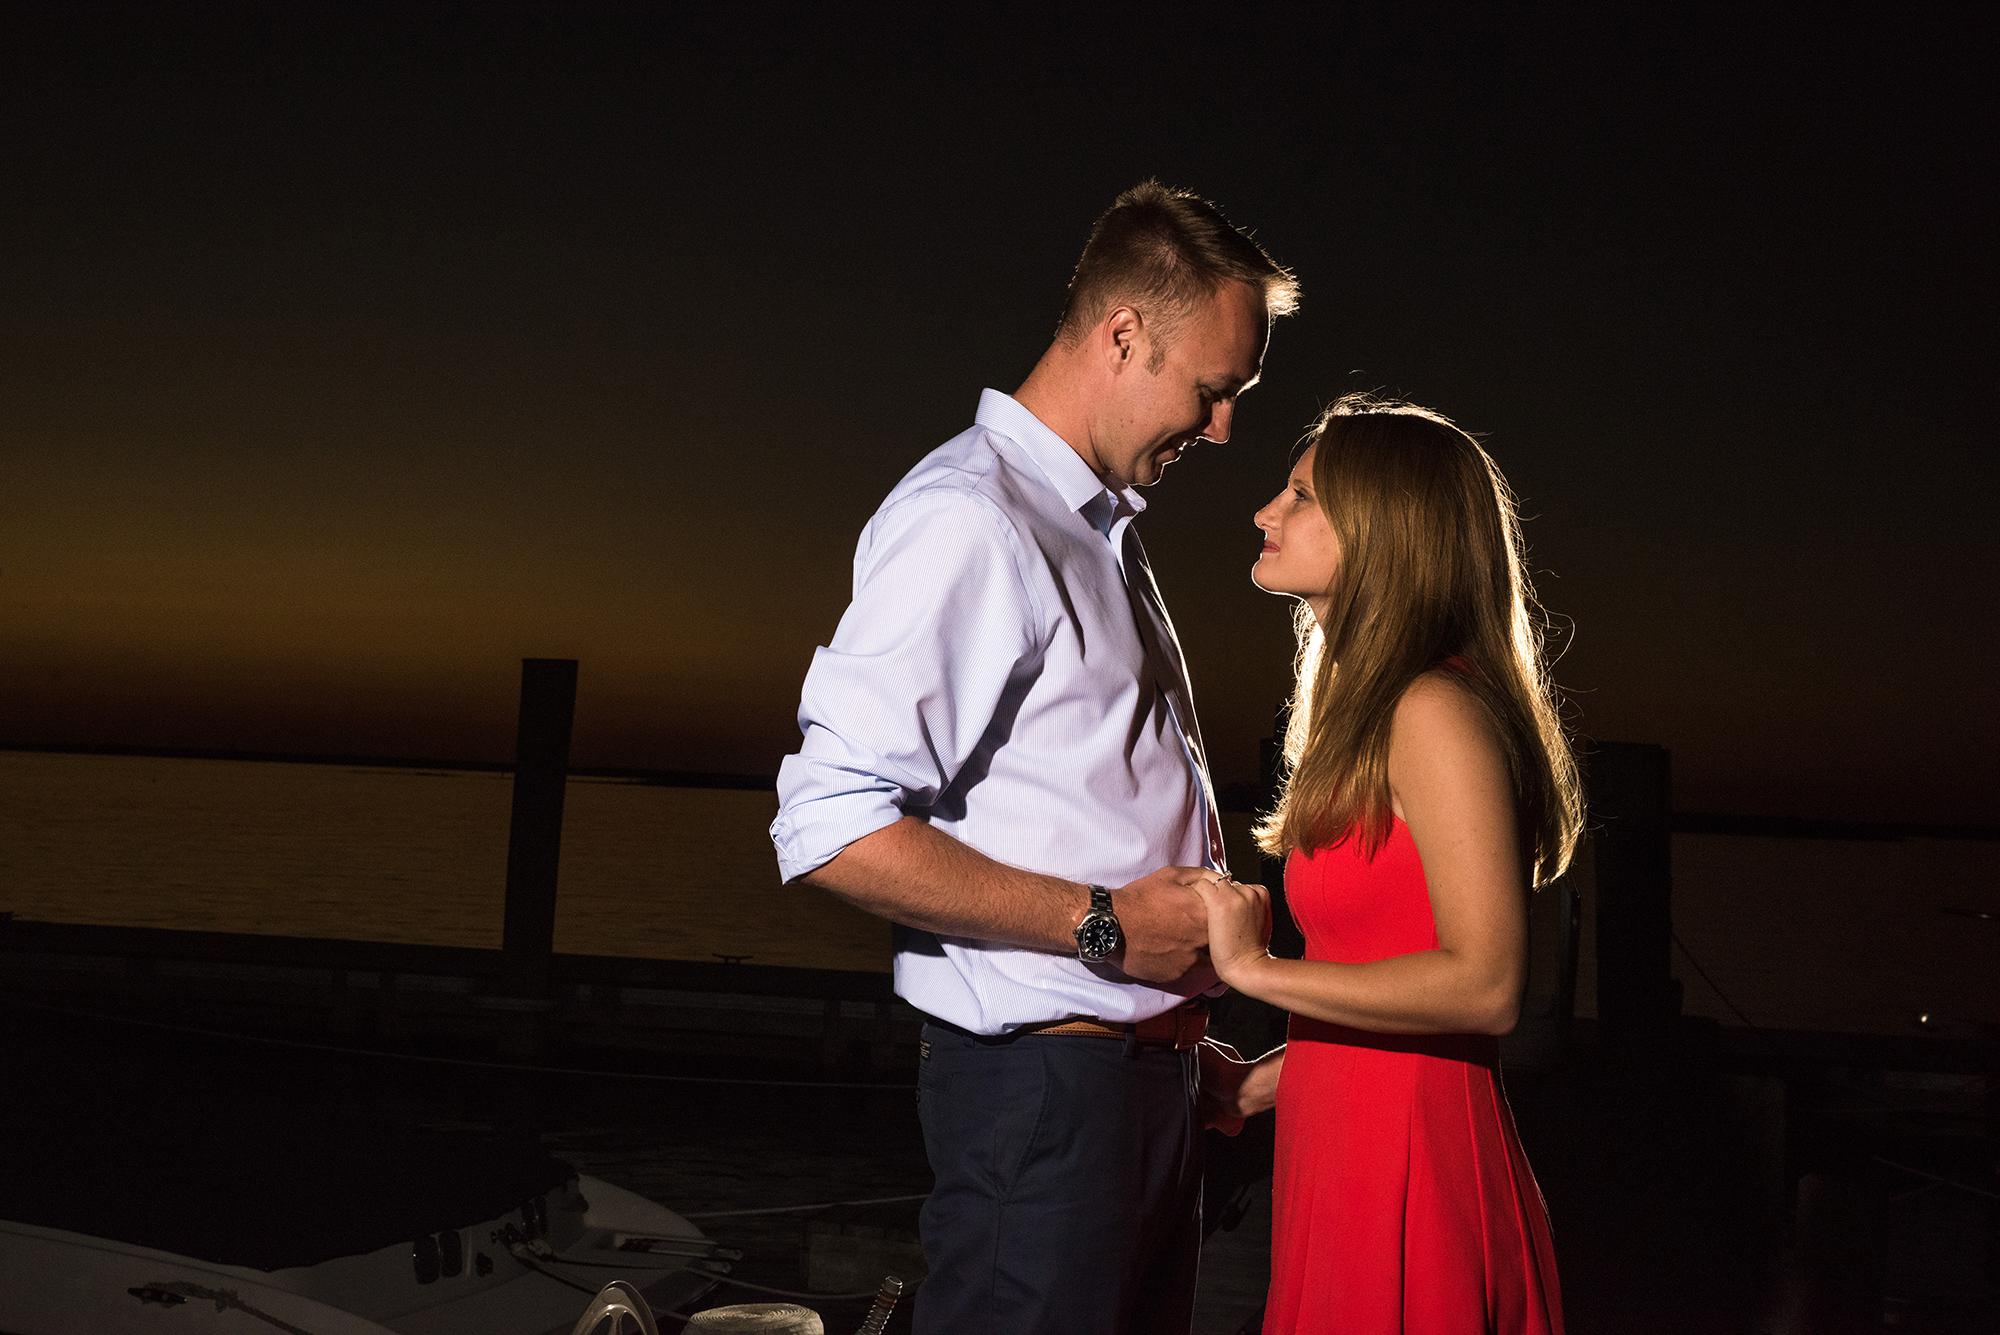 Brant Beach Yacht Club Engagement Photos - Kayla